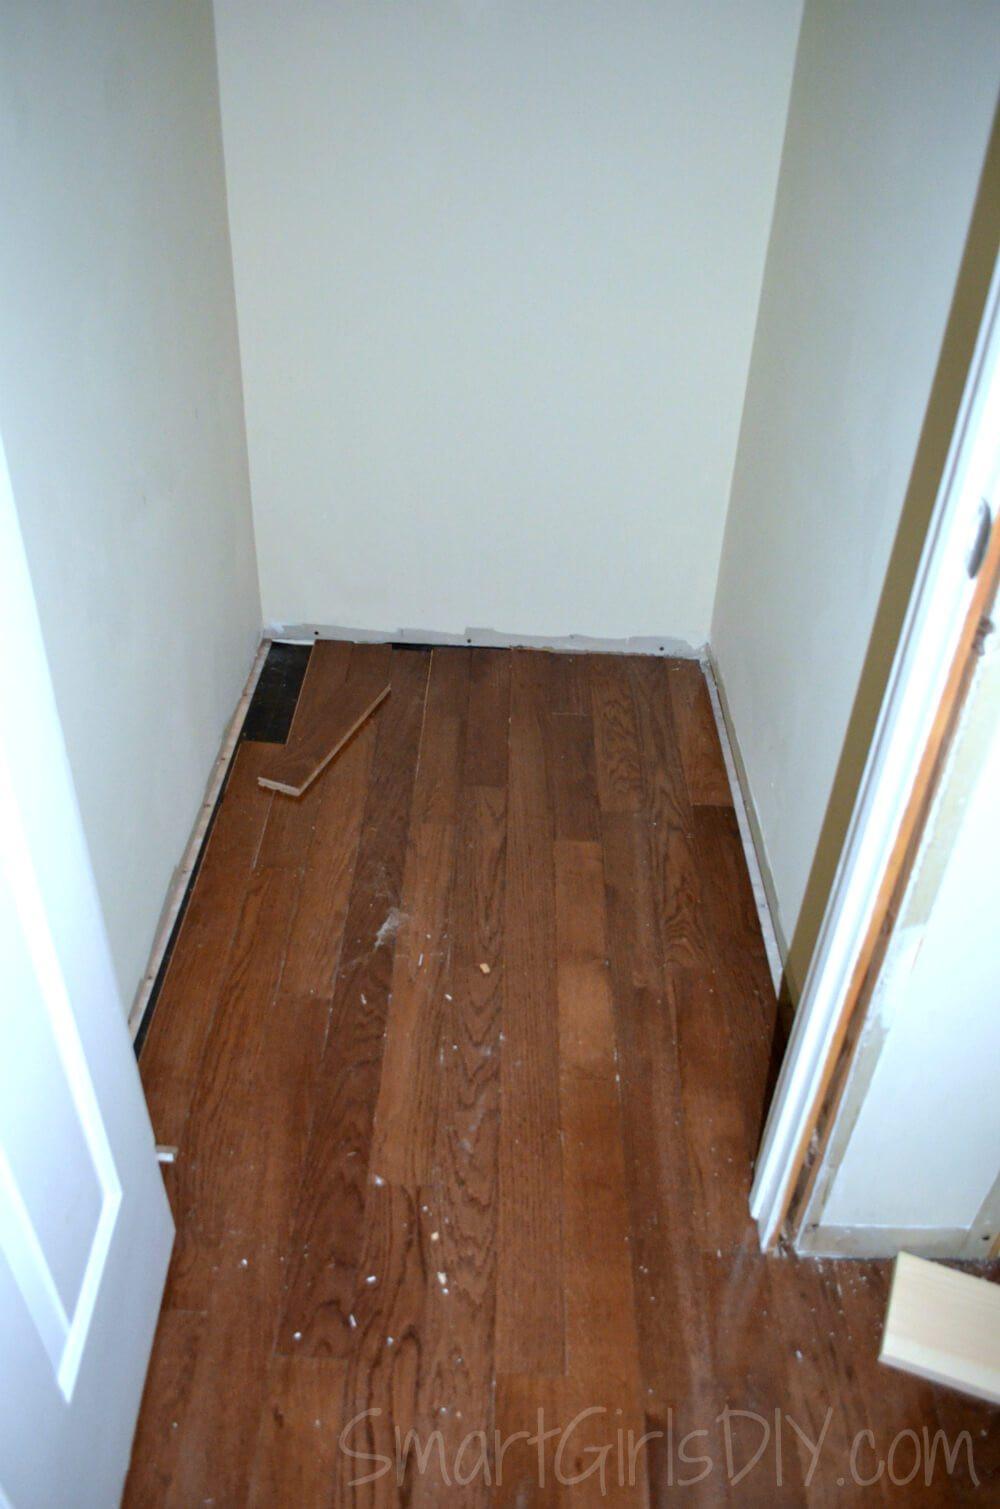 average price per square foot to install hardwood flooring of upstairs hallway 1 installing hardwood floors with regard to hardwood extends into closet